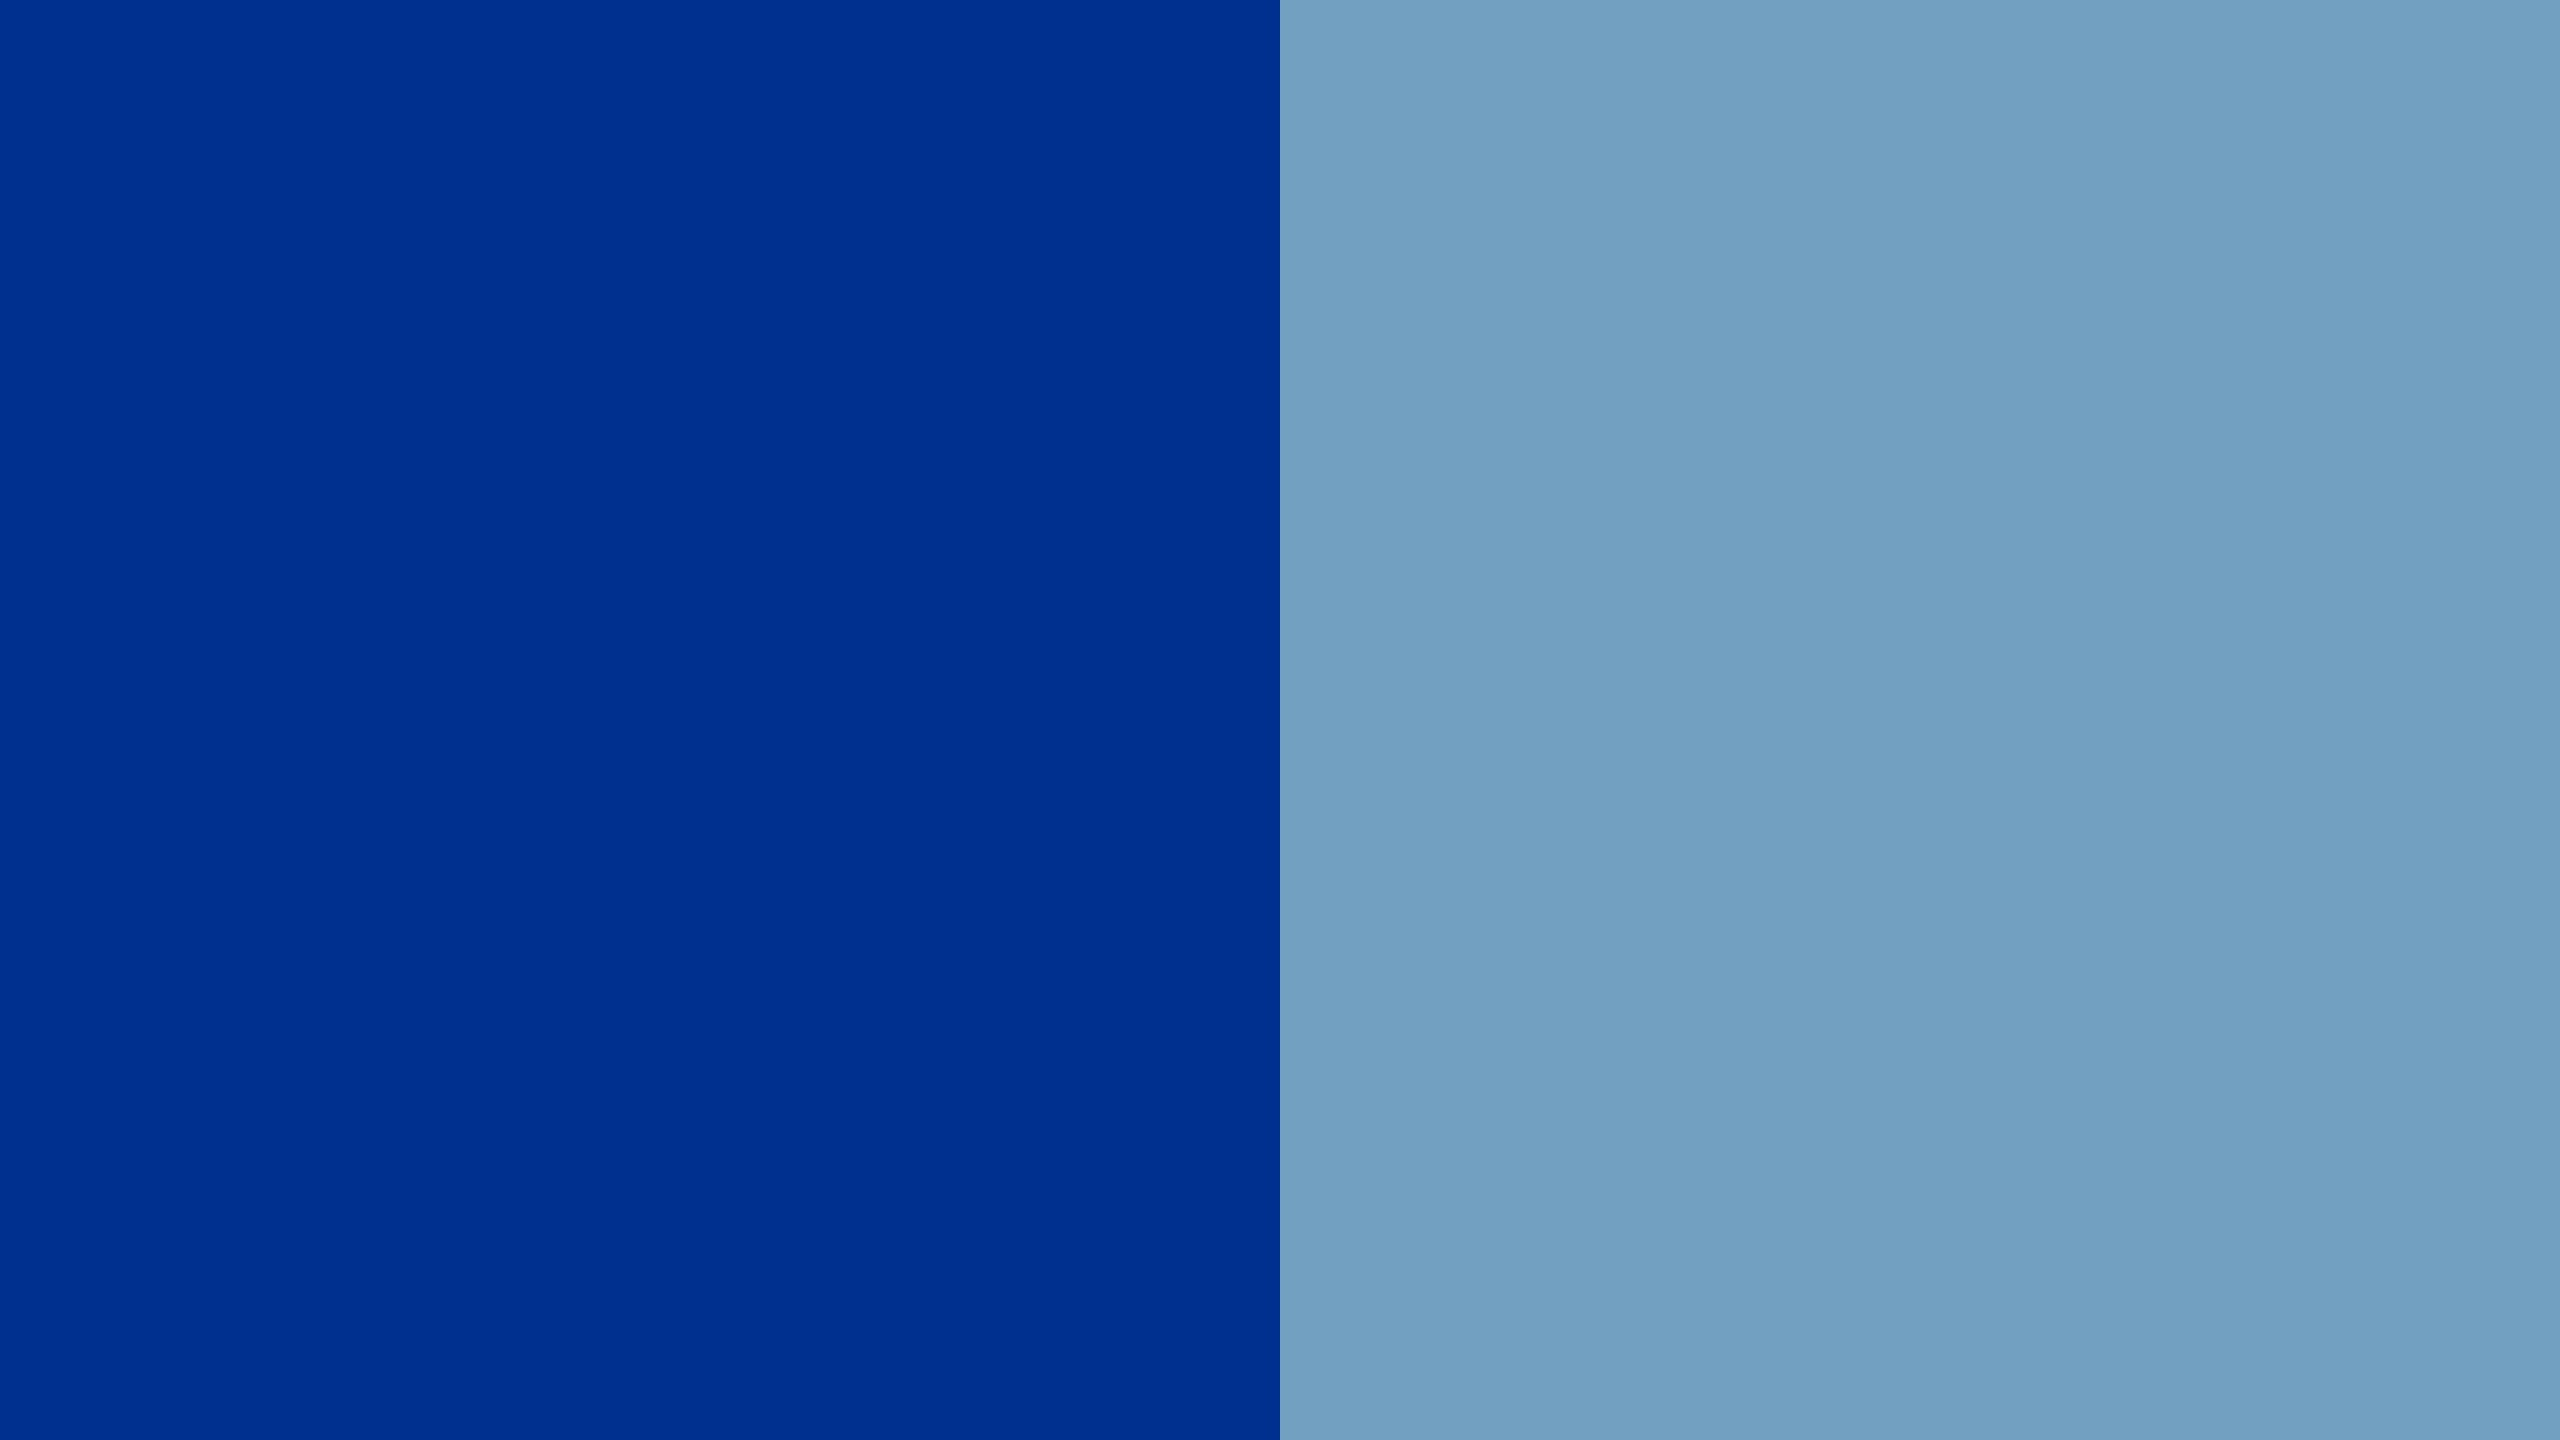 Blue Color Background Wallpaper – WallpaperSafari